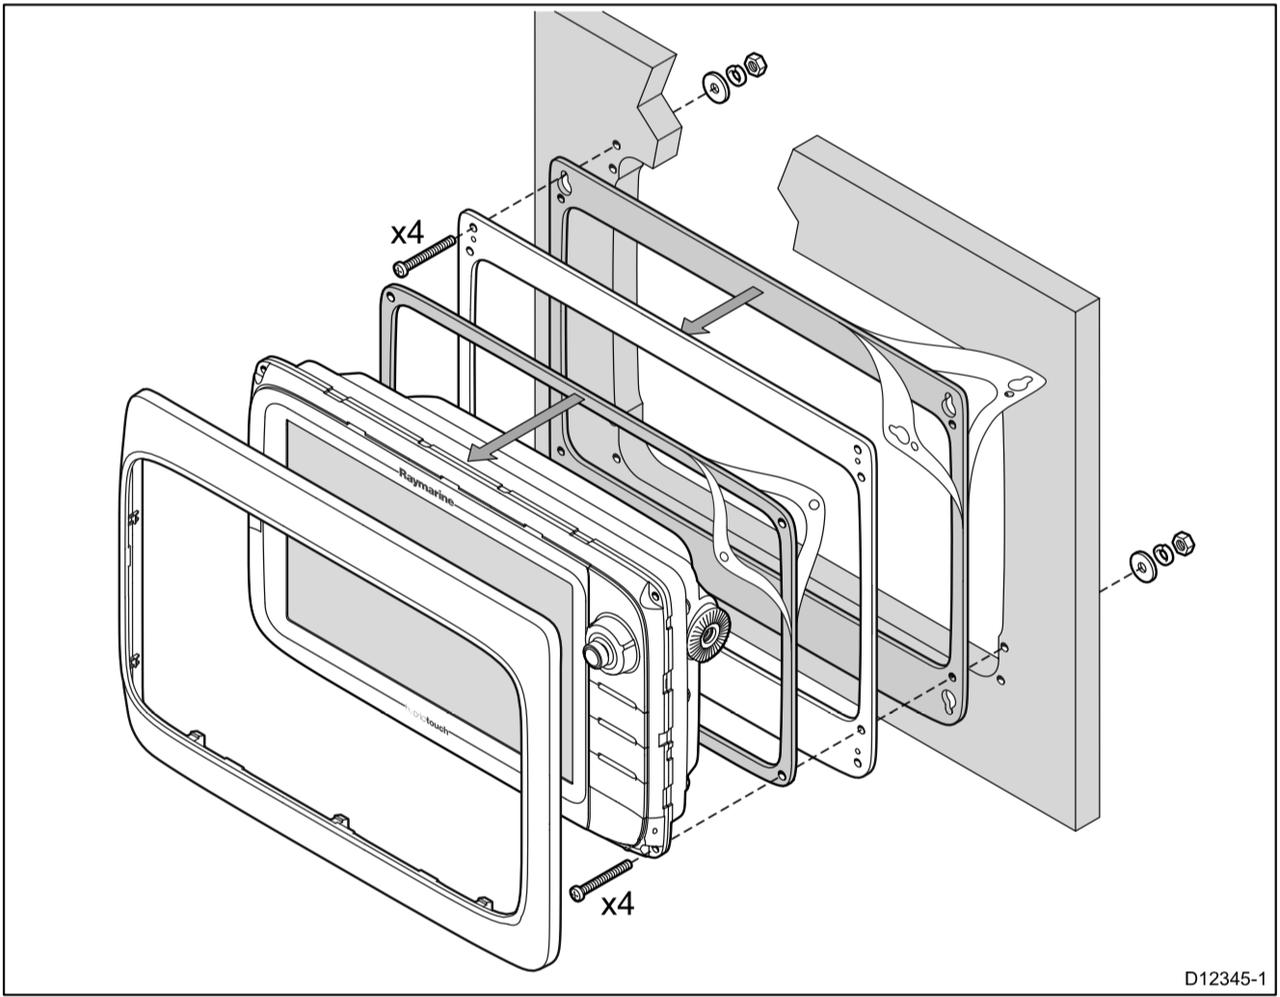 medium resolution of 441s garmin wiring diagram wiring diagram h8 q see wiring diagram 441s garmin wiring diagram